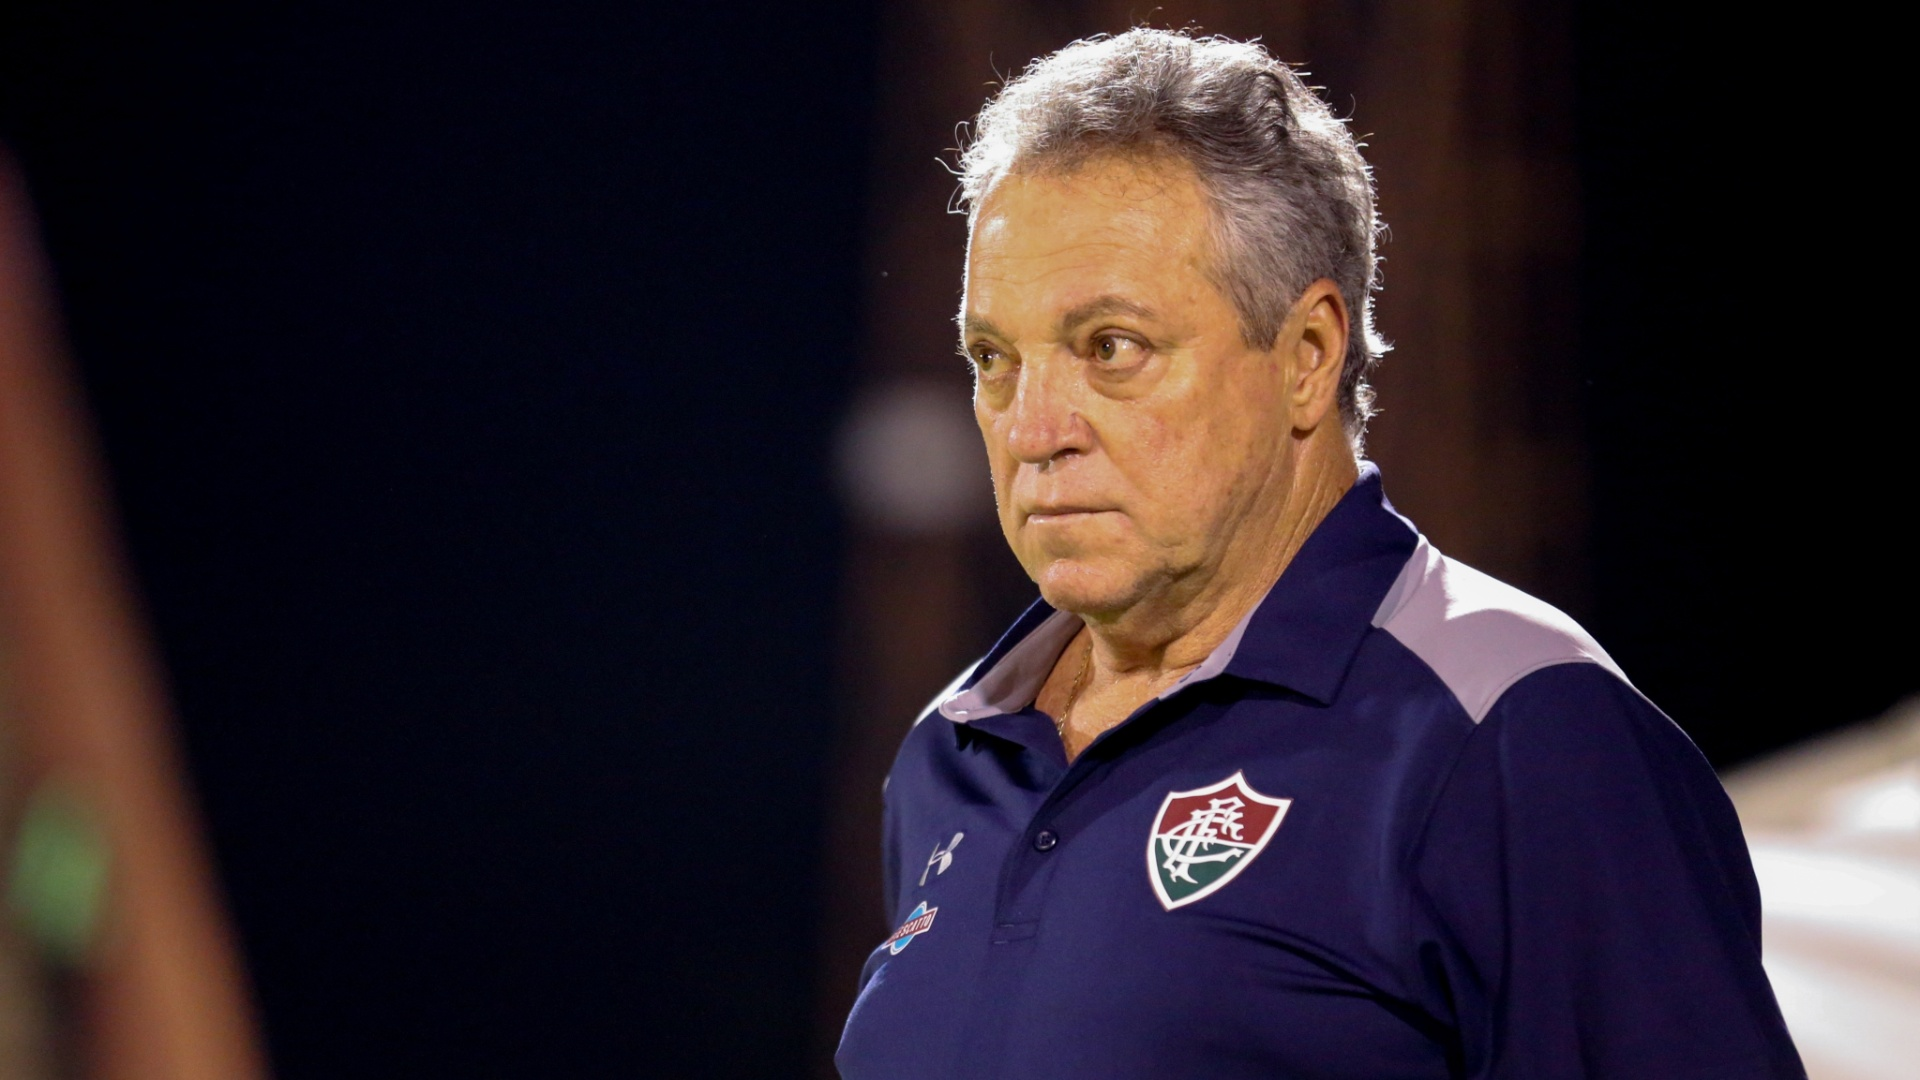 Abel Braga orienta jogadores do Fluminense em partida contra a Portuguesa-RJ